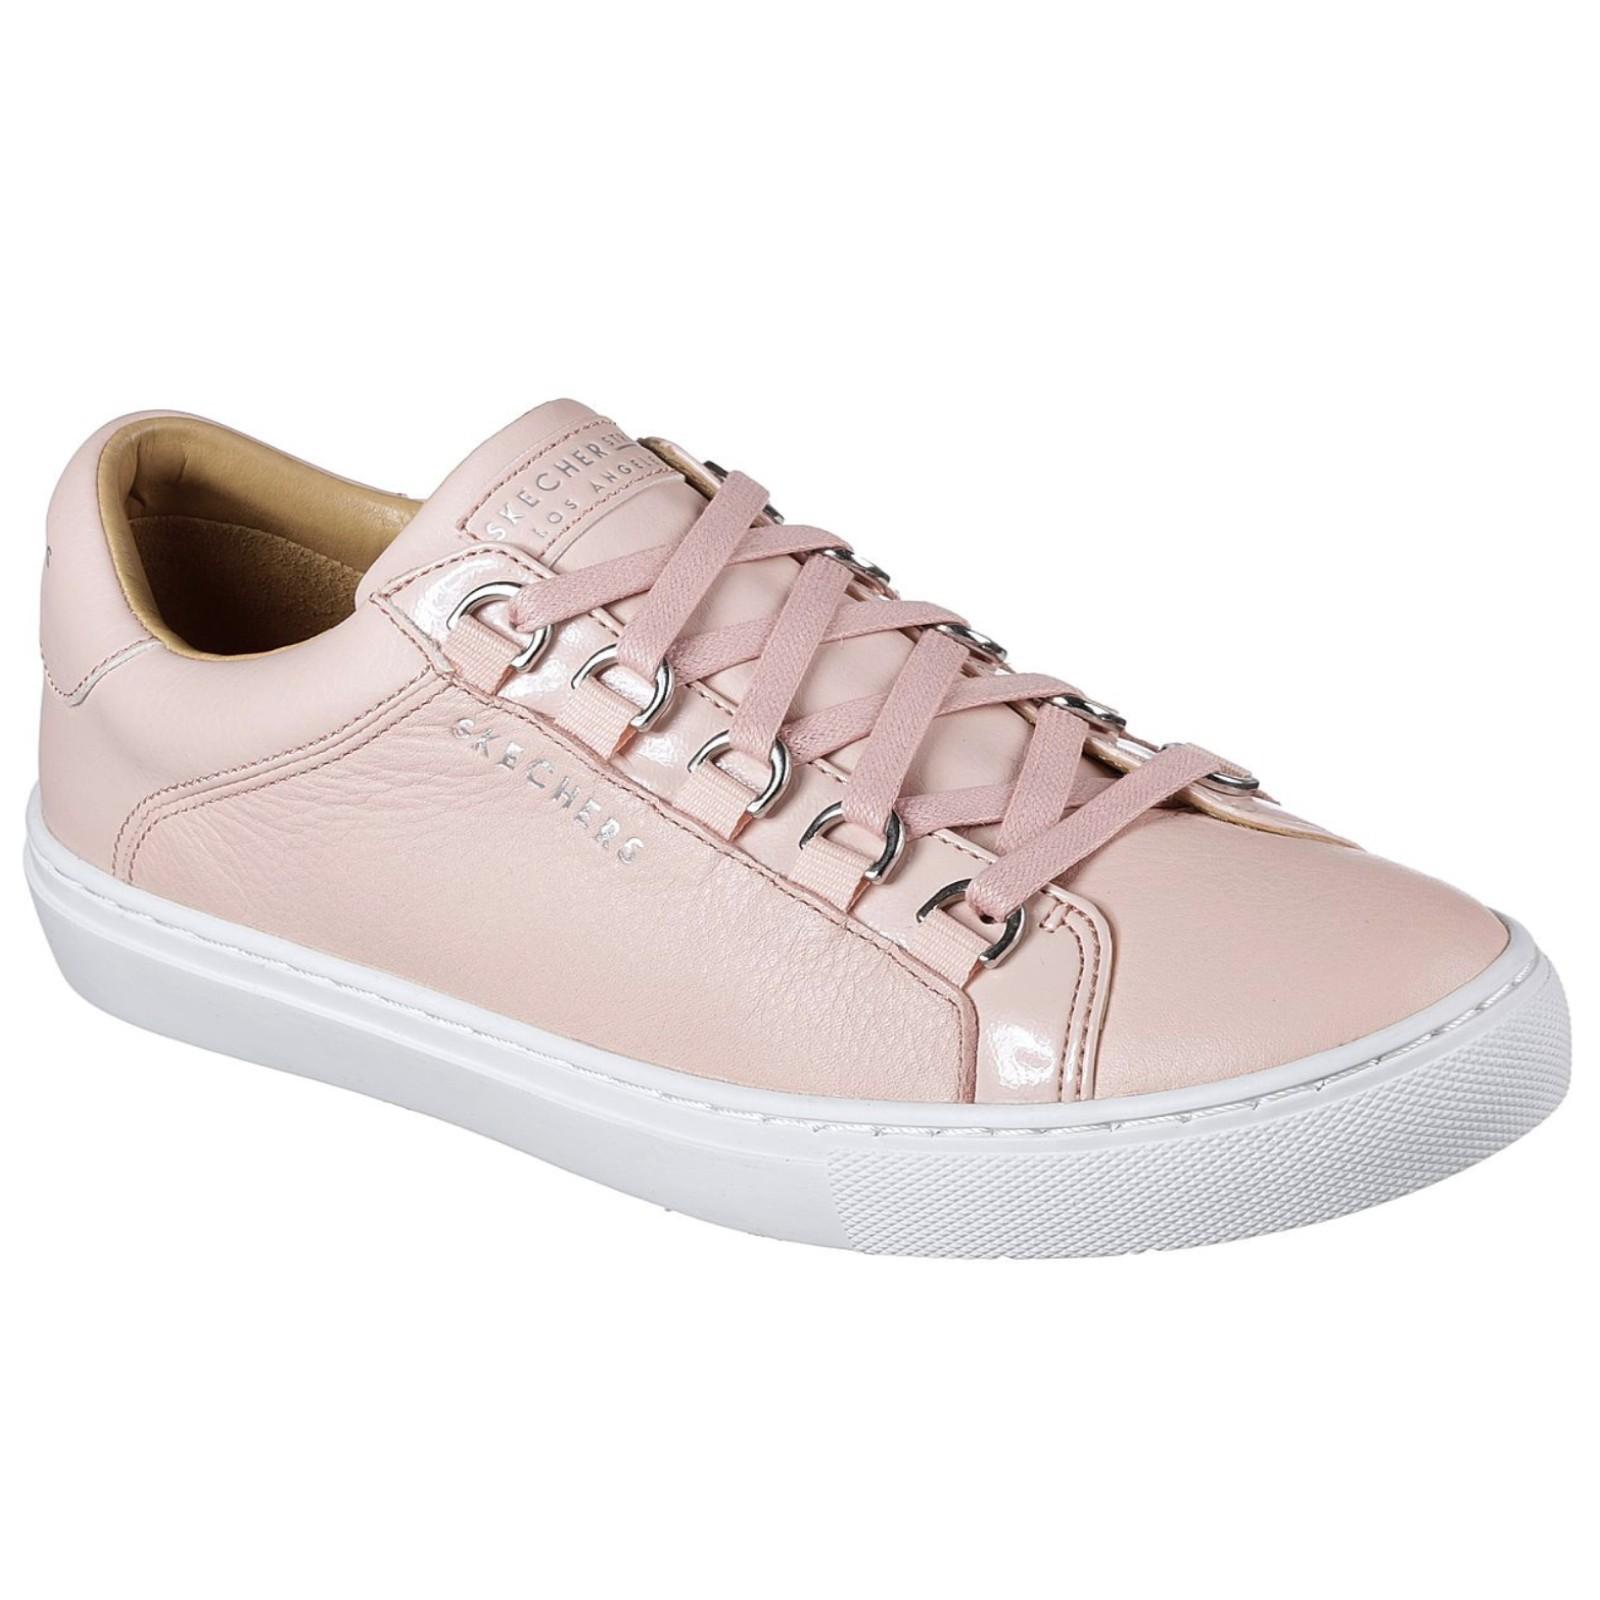 04612 Skechers női sportos félcipő 73532 LTPK Side Street